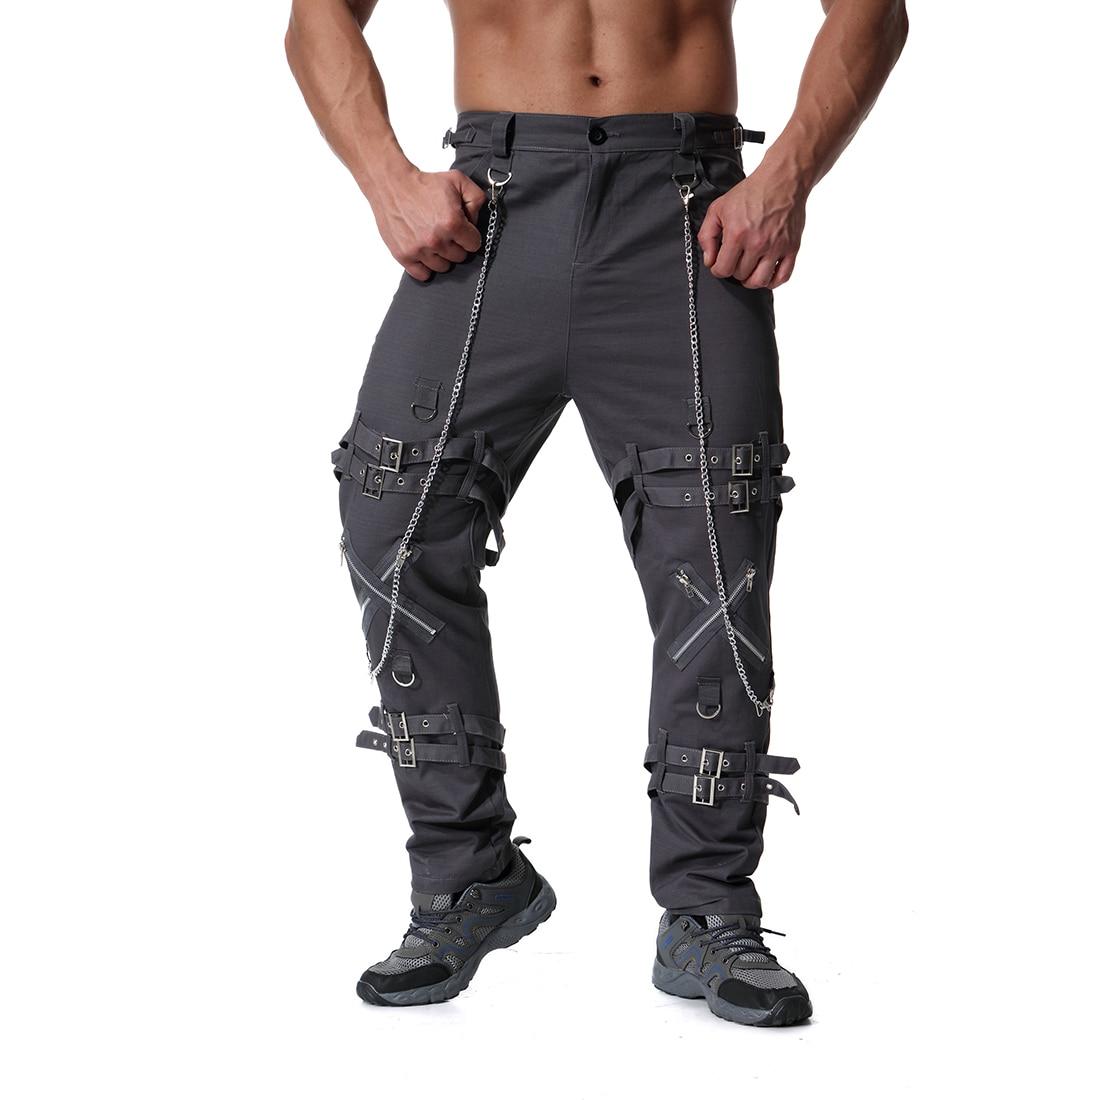 Pantalones para hombre, pantalones de chándal, pantalones de chándal, pantalones para hombre, hip hop, Camuflaje, pantalones tácticos de carga, Militar - 4